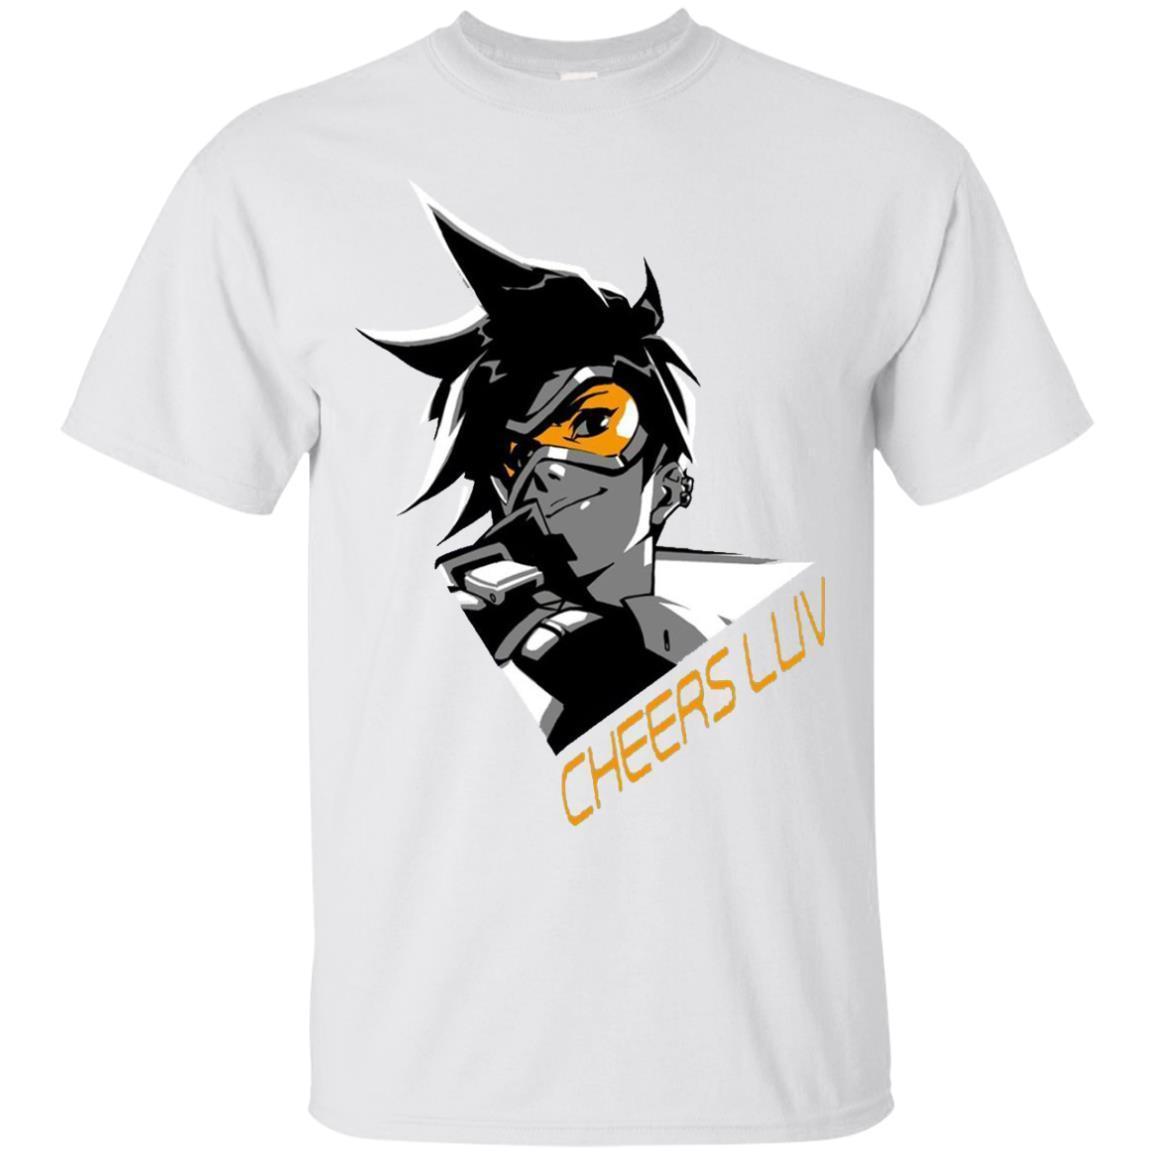 Overwatch Tracer Cheers Spray Tee Shirt